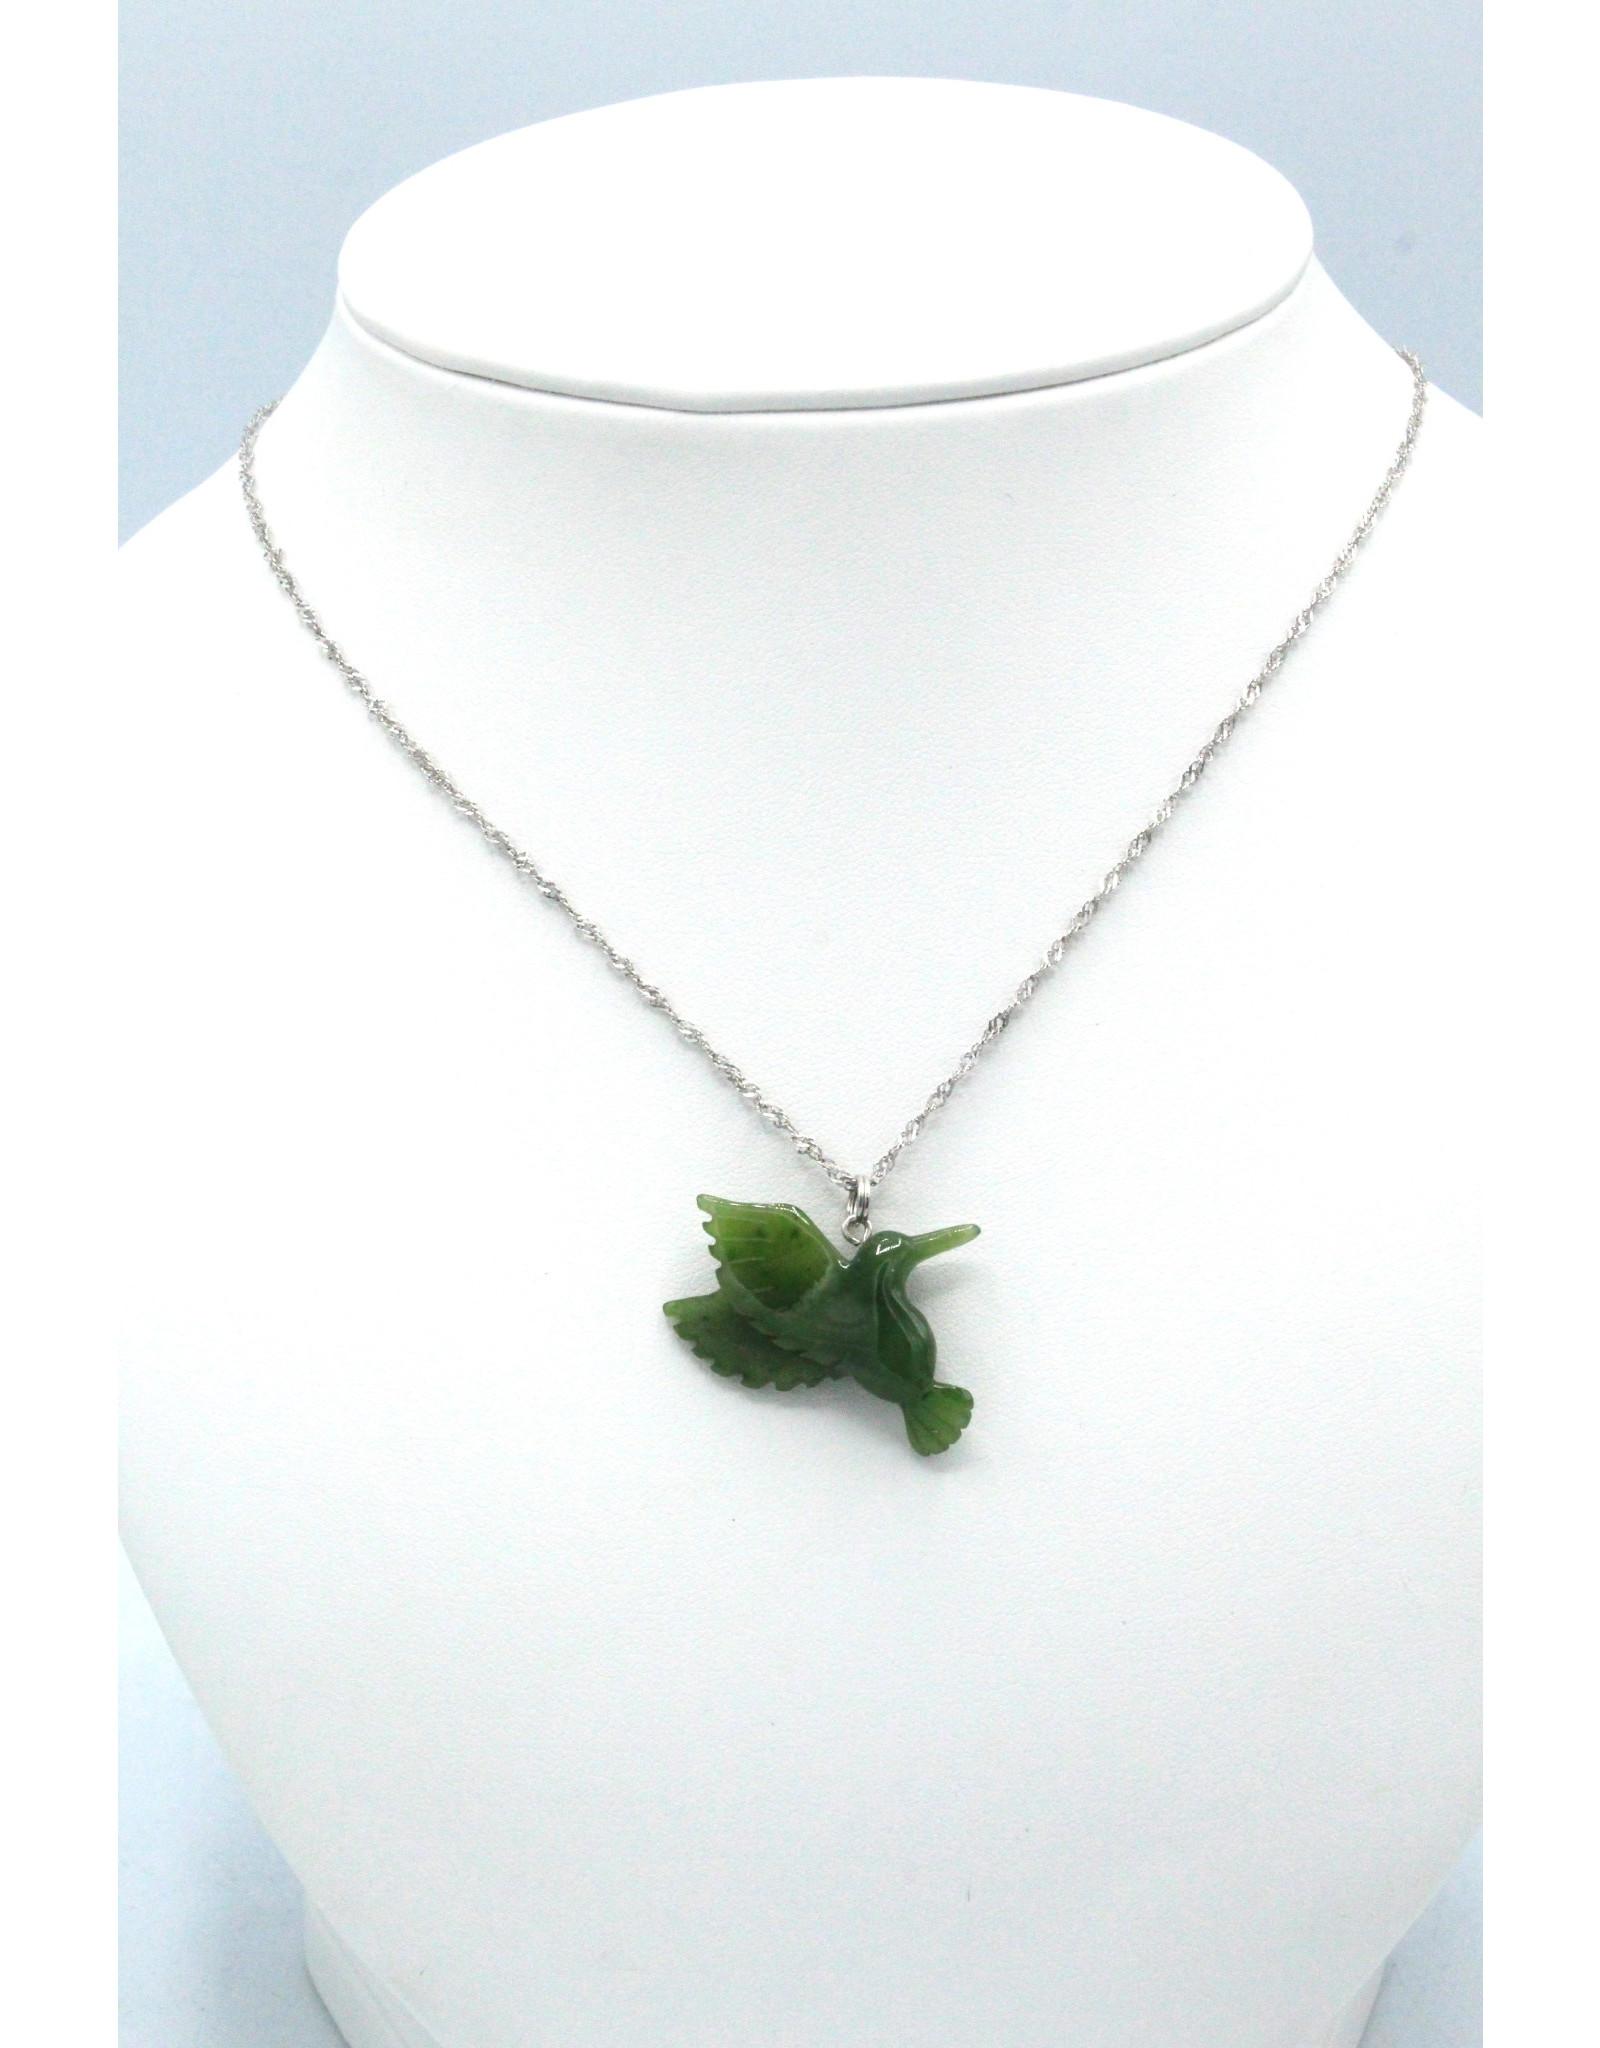 Jade Hummingbird Necklace - JPS118